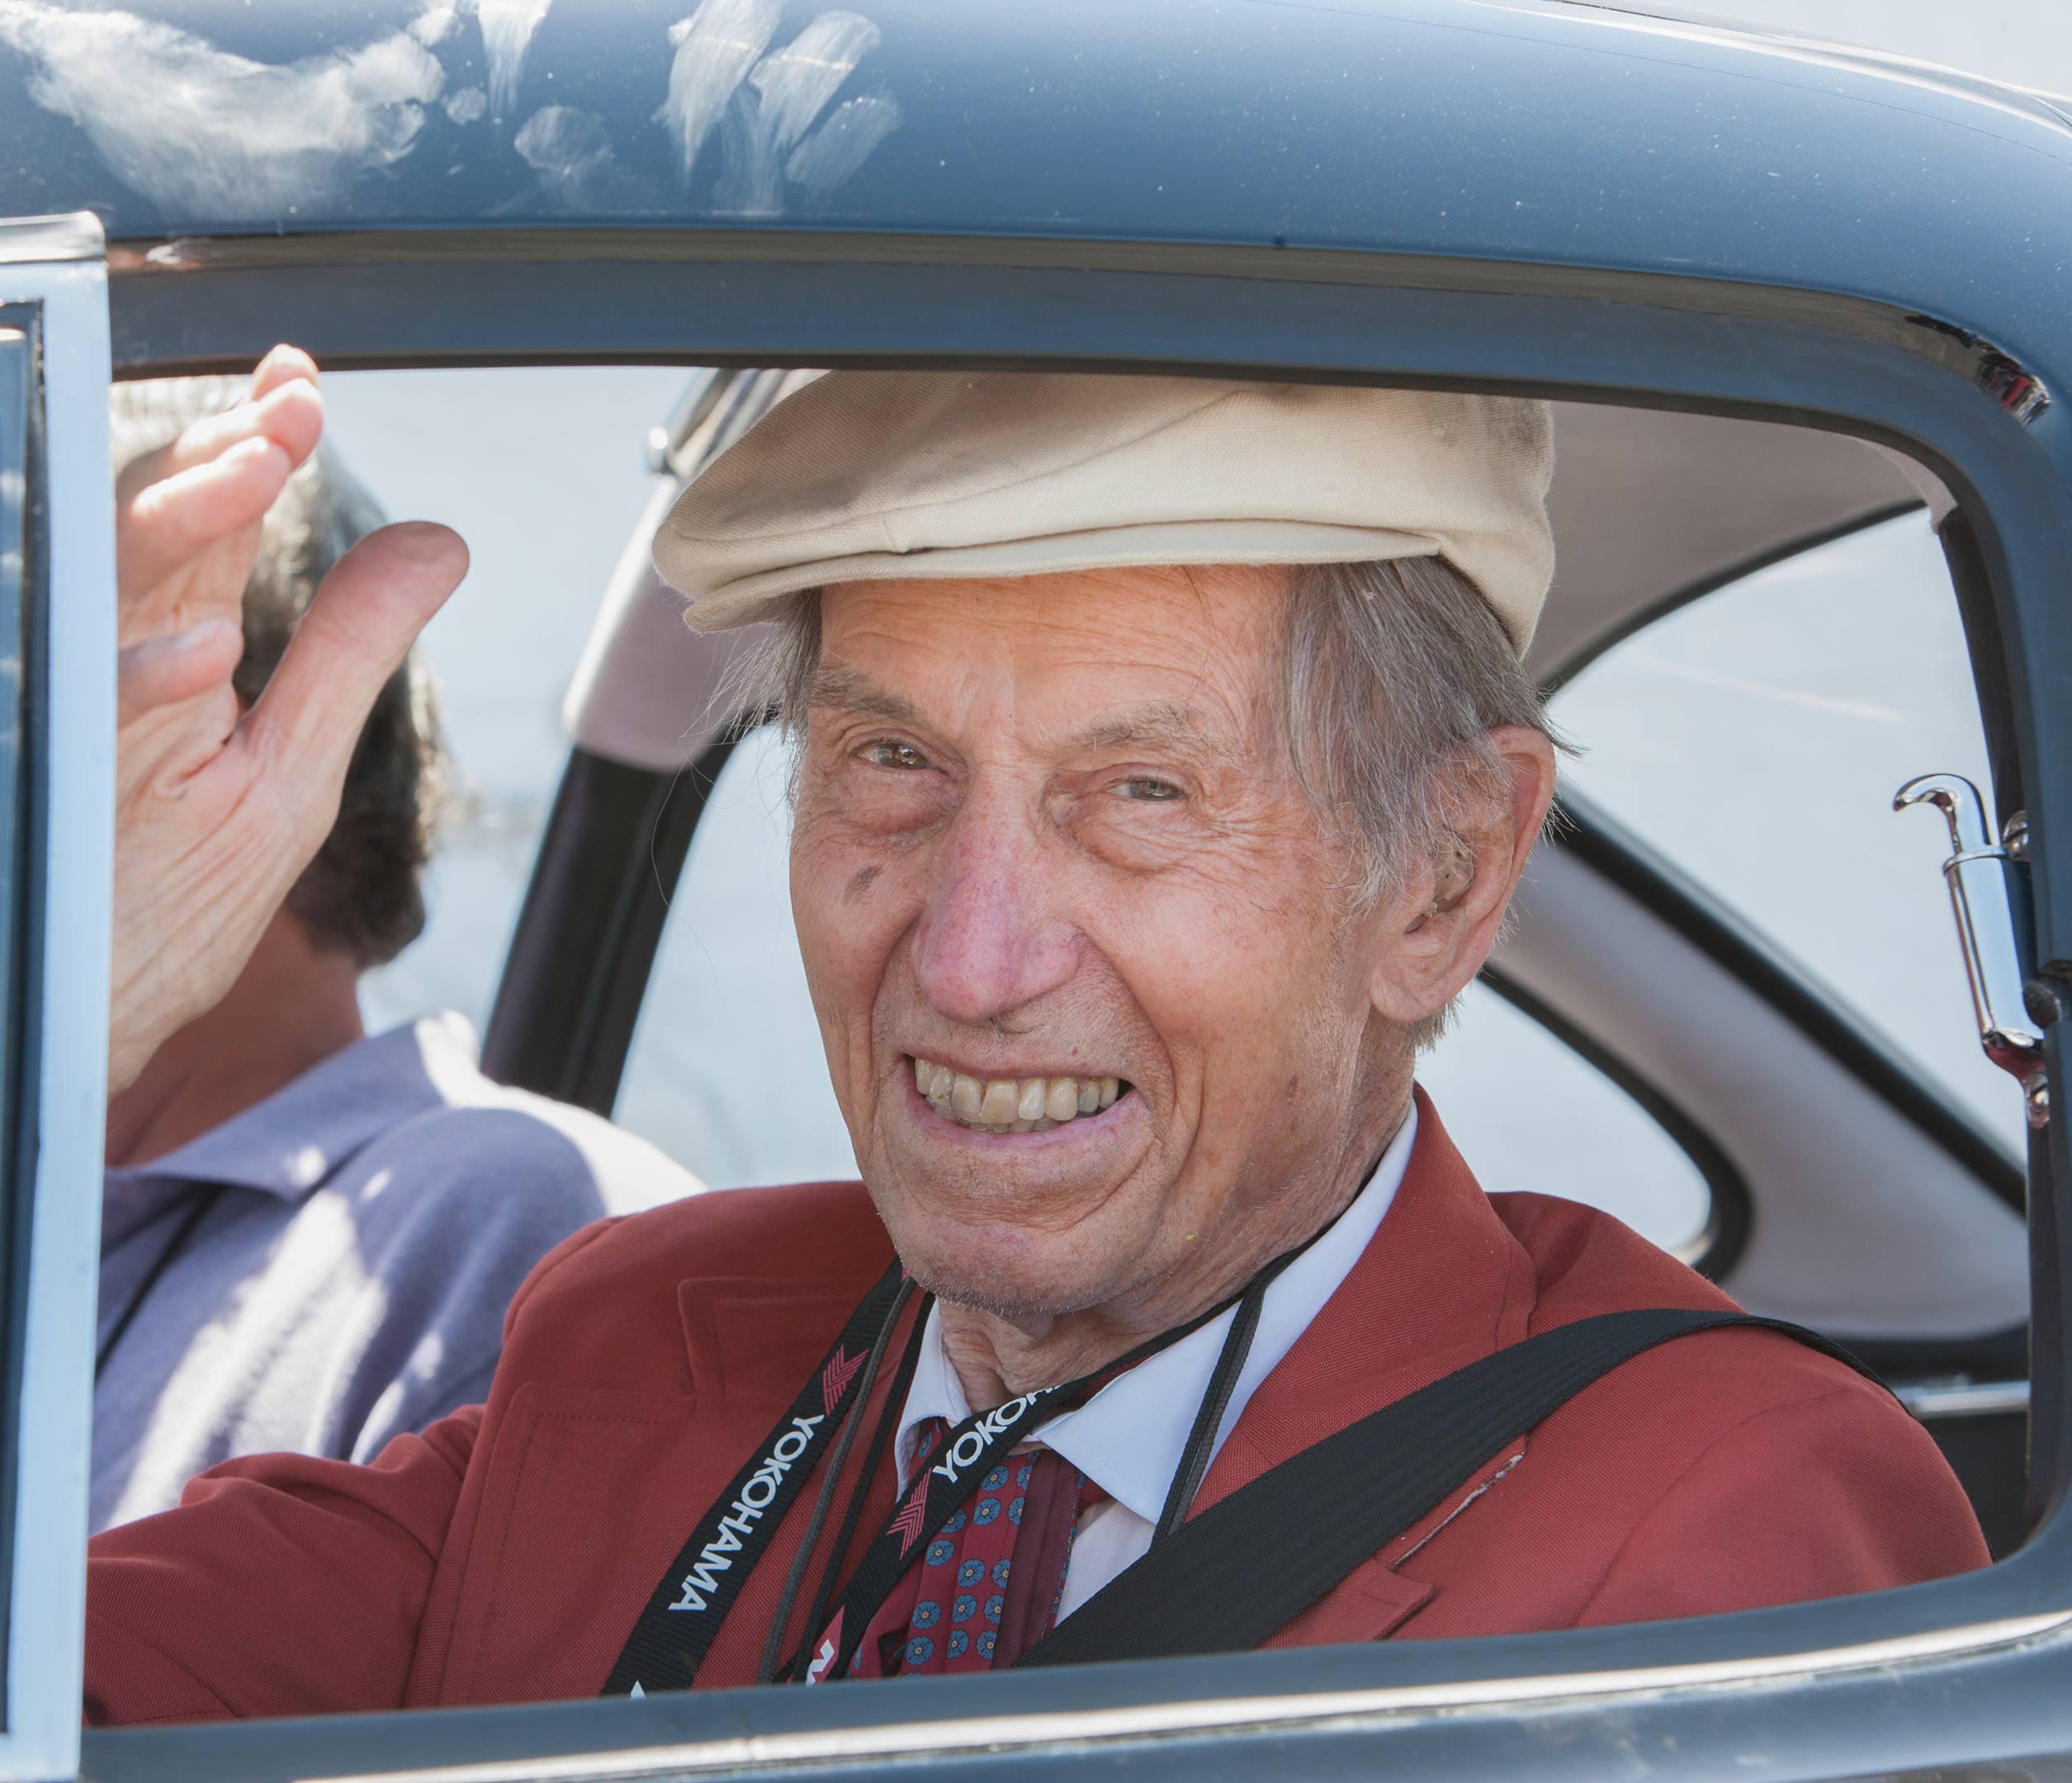 Renaissance man: Visionary thinking and fast driving were John Fitch trademarks thumbnail